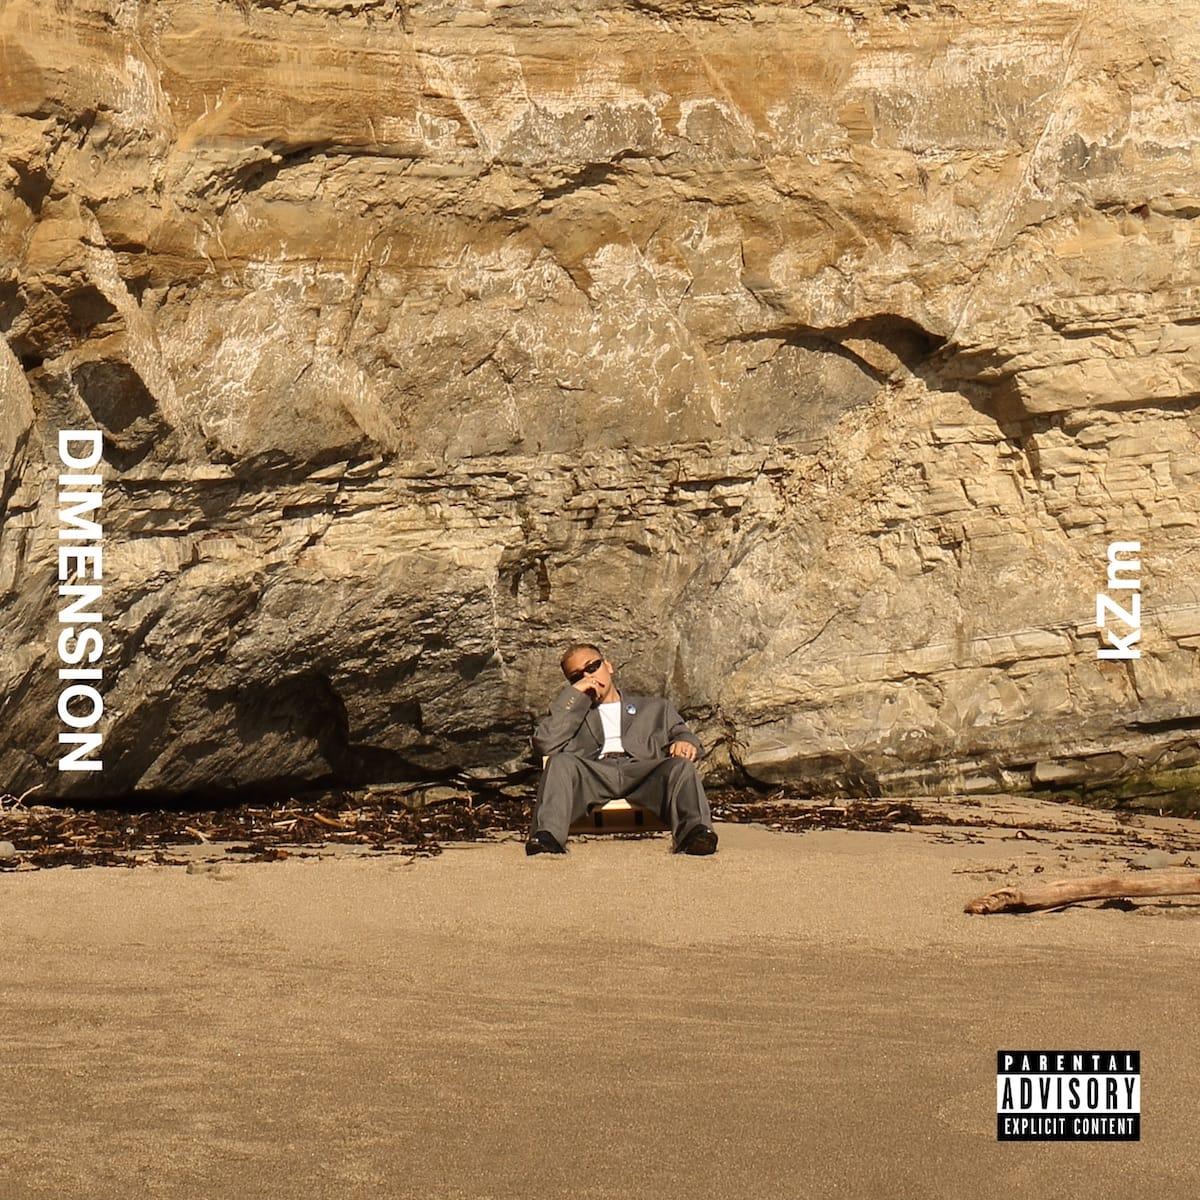 kZm(YENTOWN)が1stアルバム『DIMENSION』のリリースツアーを発表! music180522-kzm-2-1200x1200